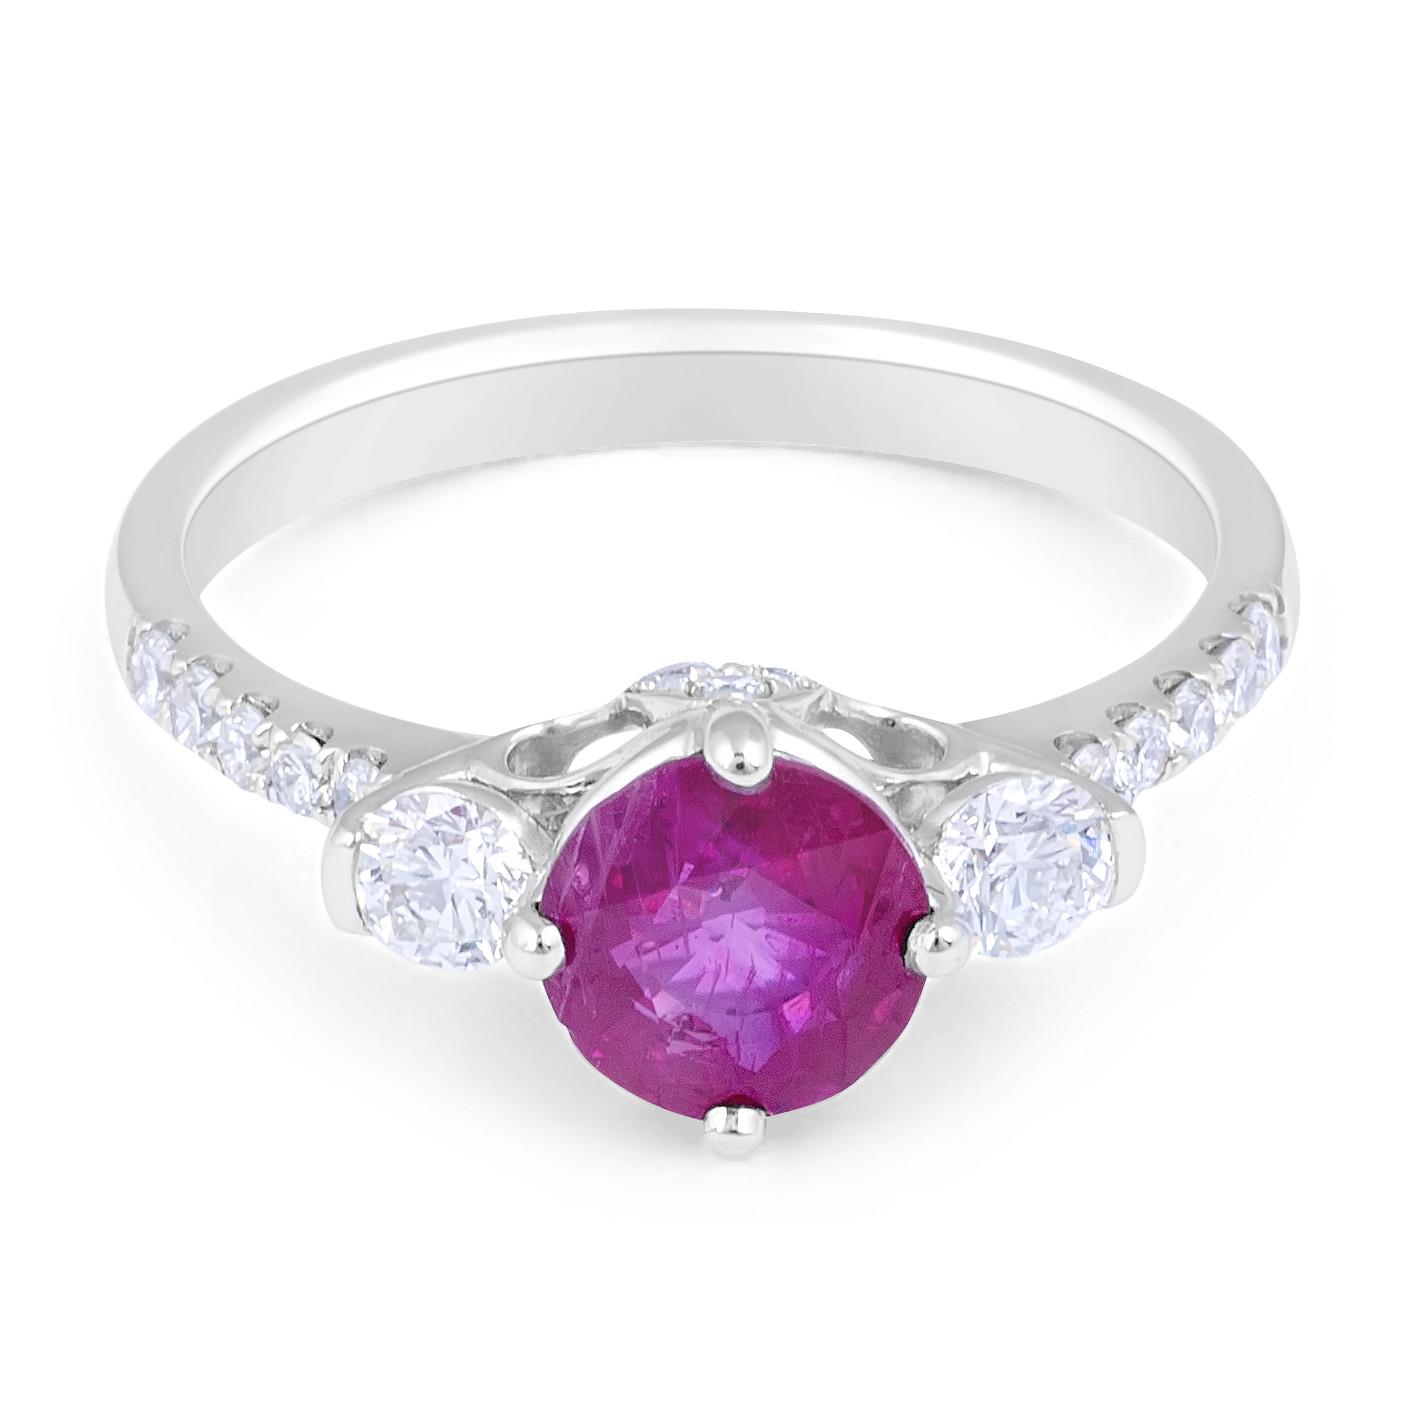 ruby diamond trilogy engagement ring in 18 karat white gold. Black Bedroom Furniture Sets. Home Design Ideas